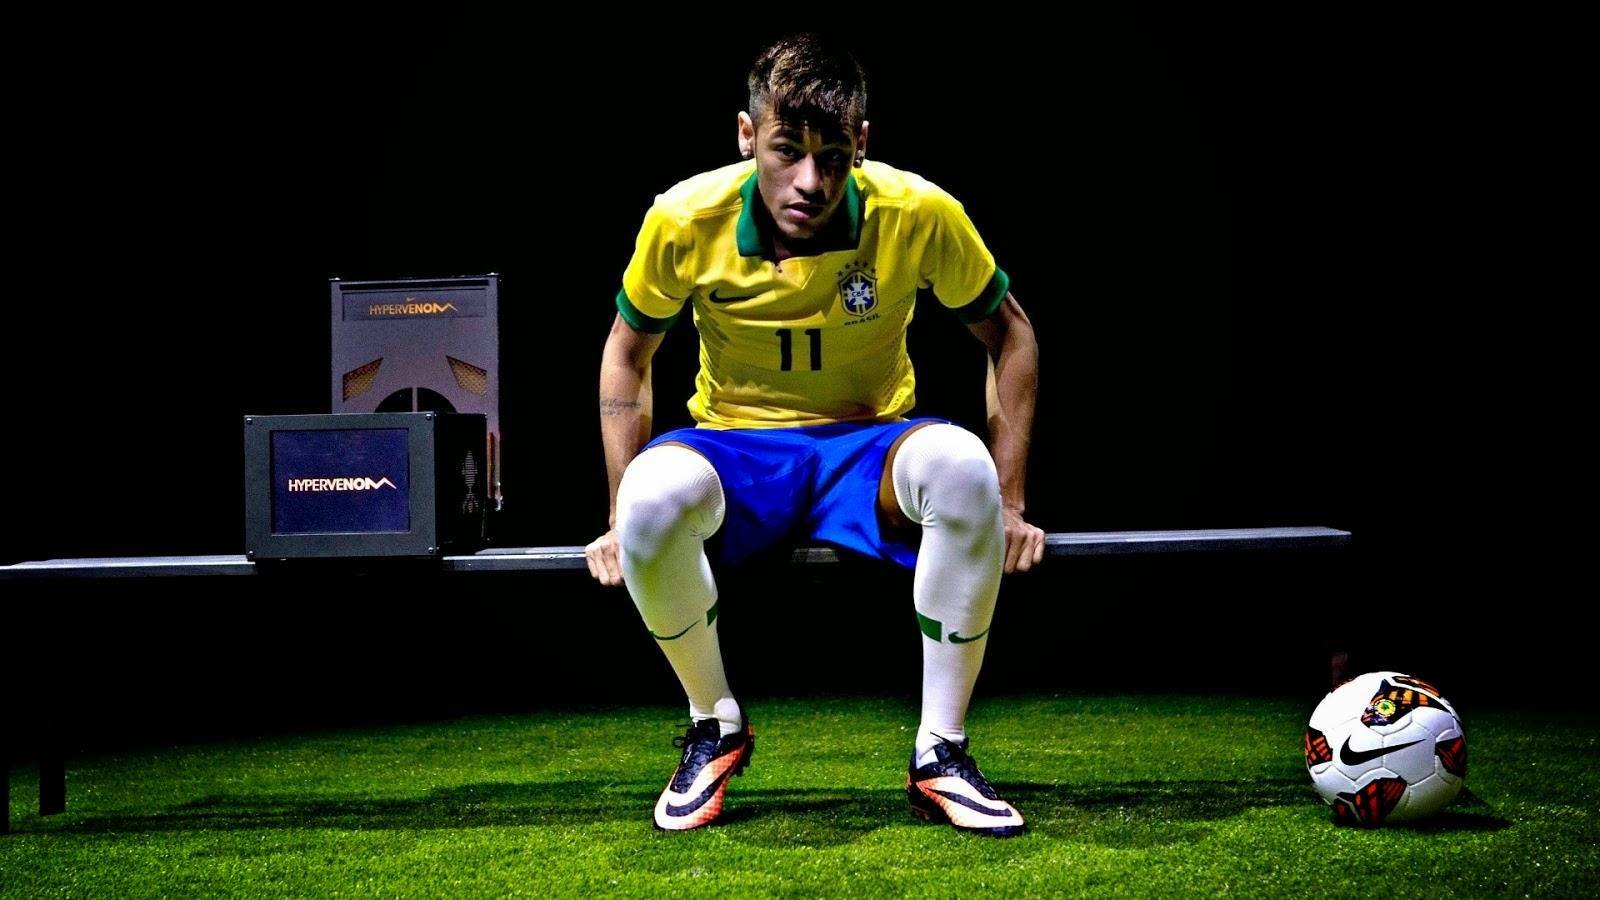 all sports players: neymar jr hd wallpapers 2014